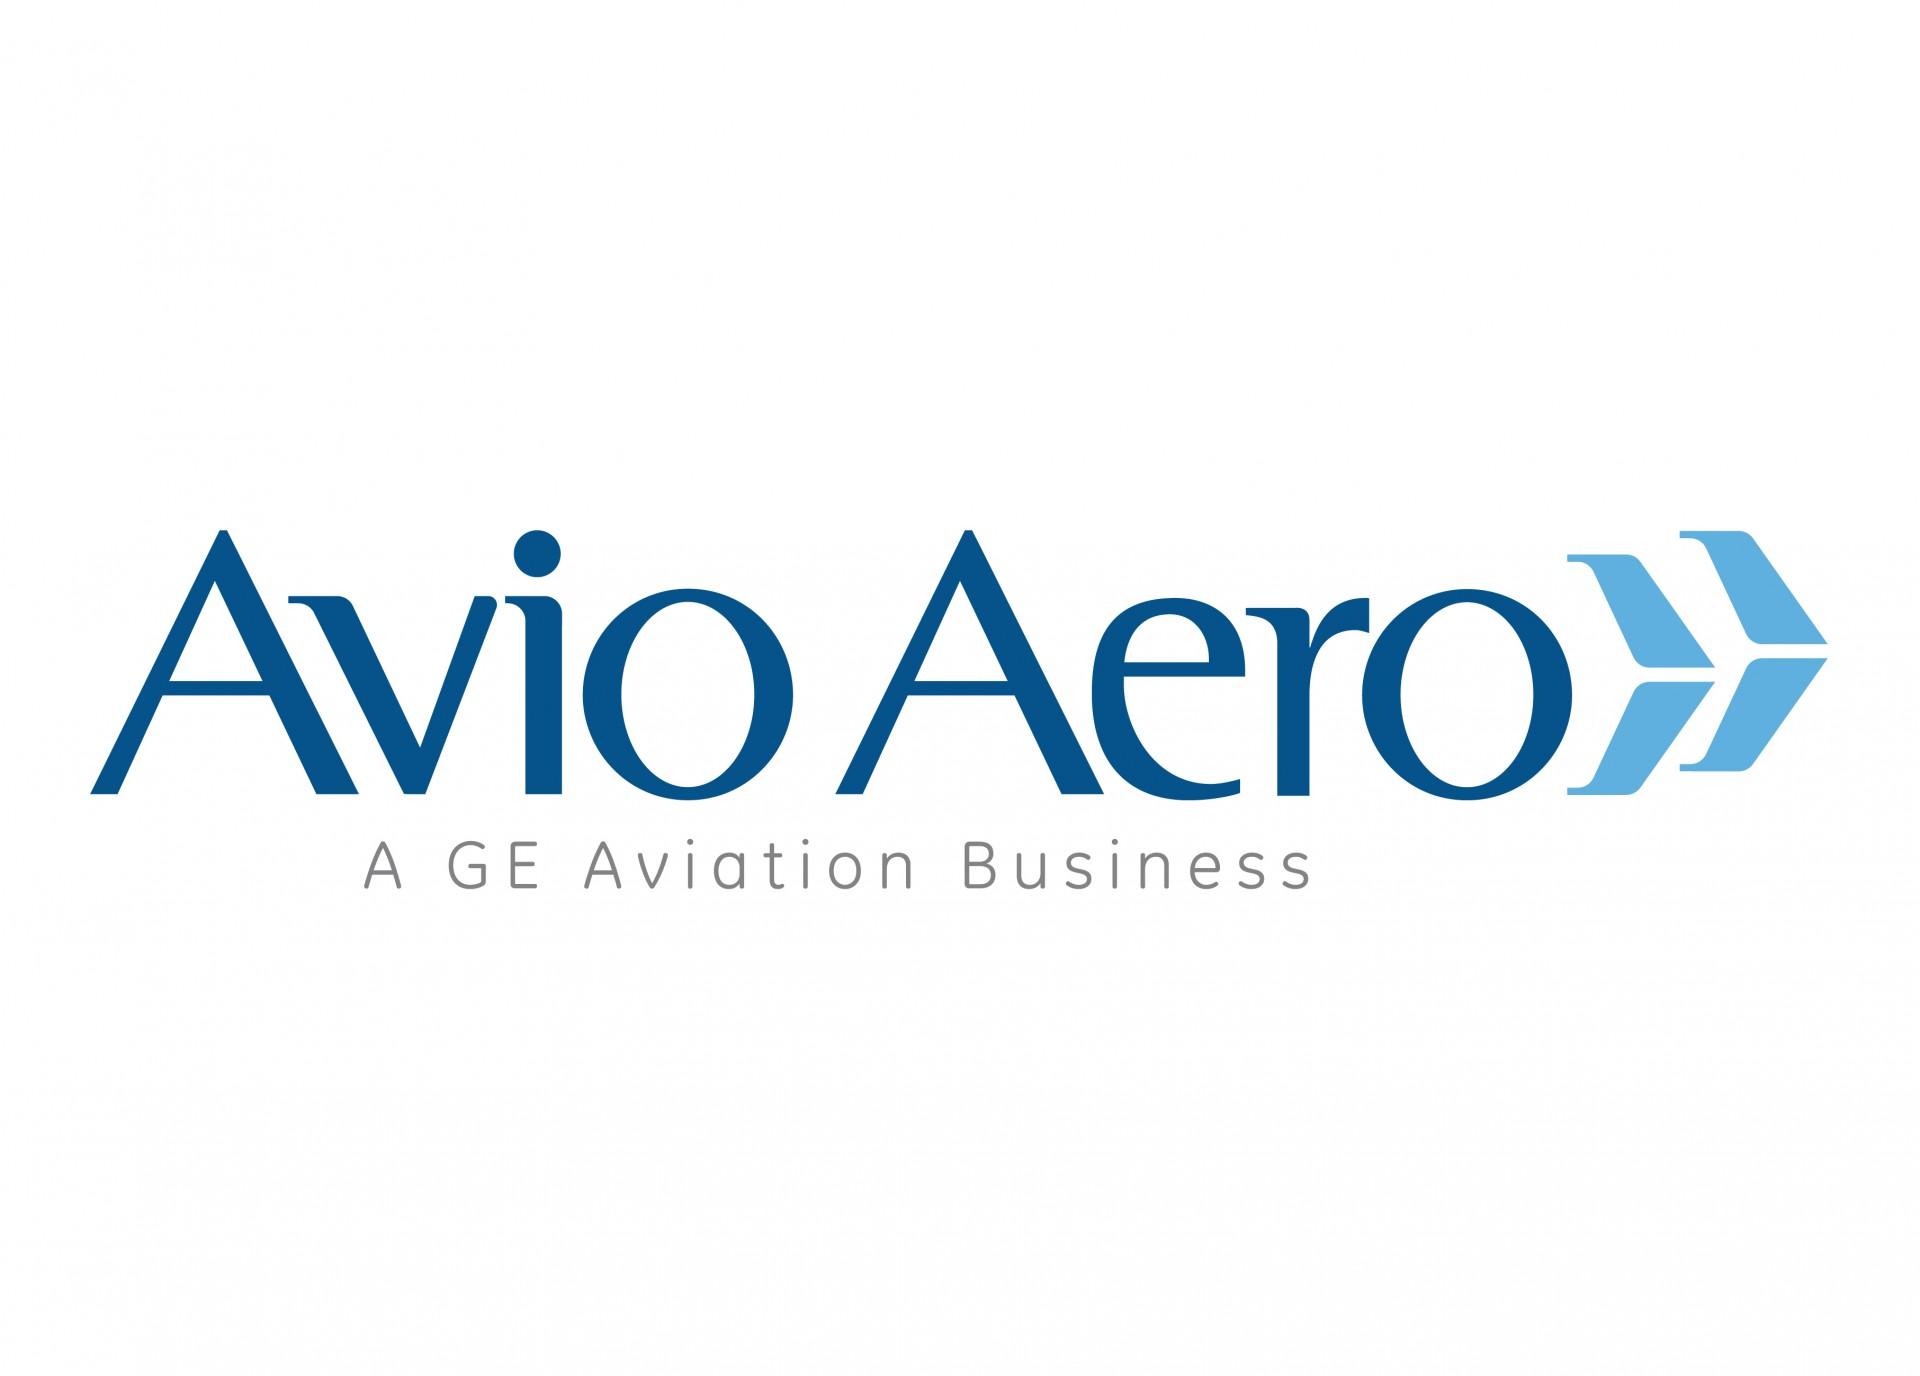 Avio Aero logo